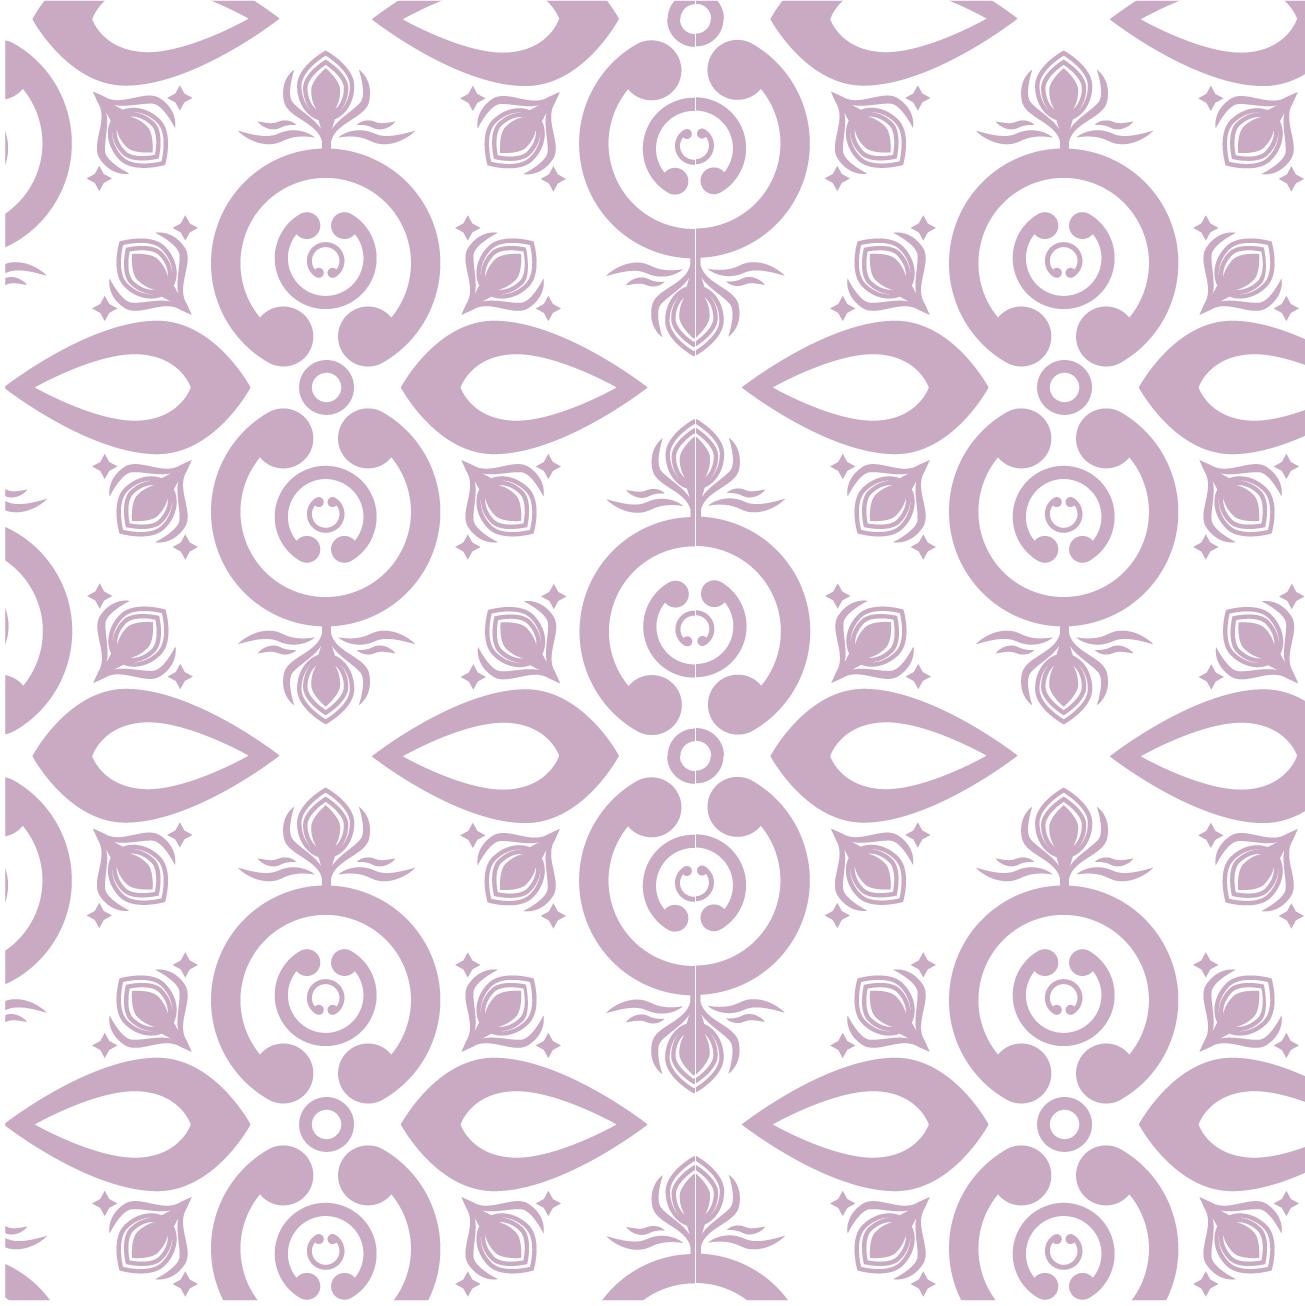 melos_logo_pattern-15.jpg